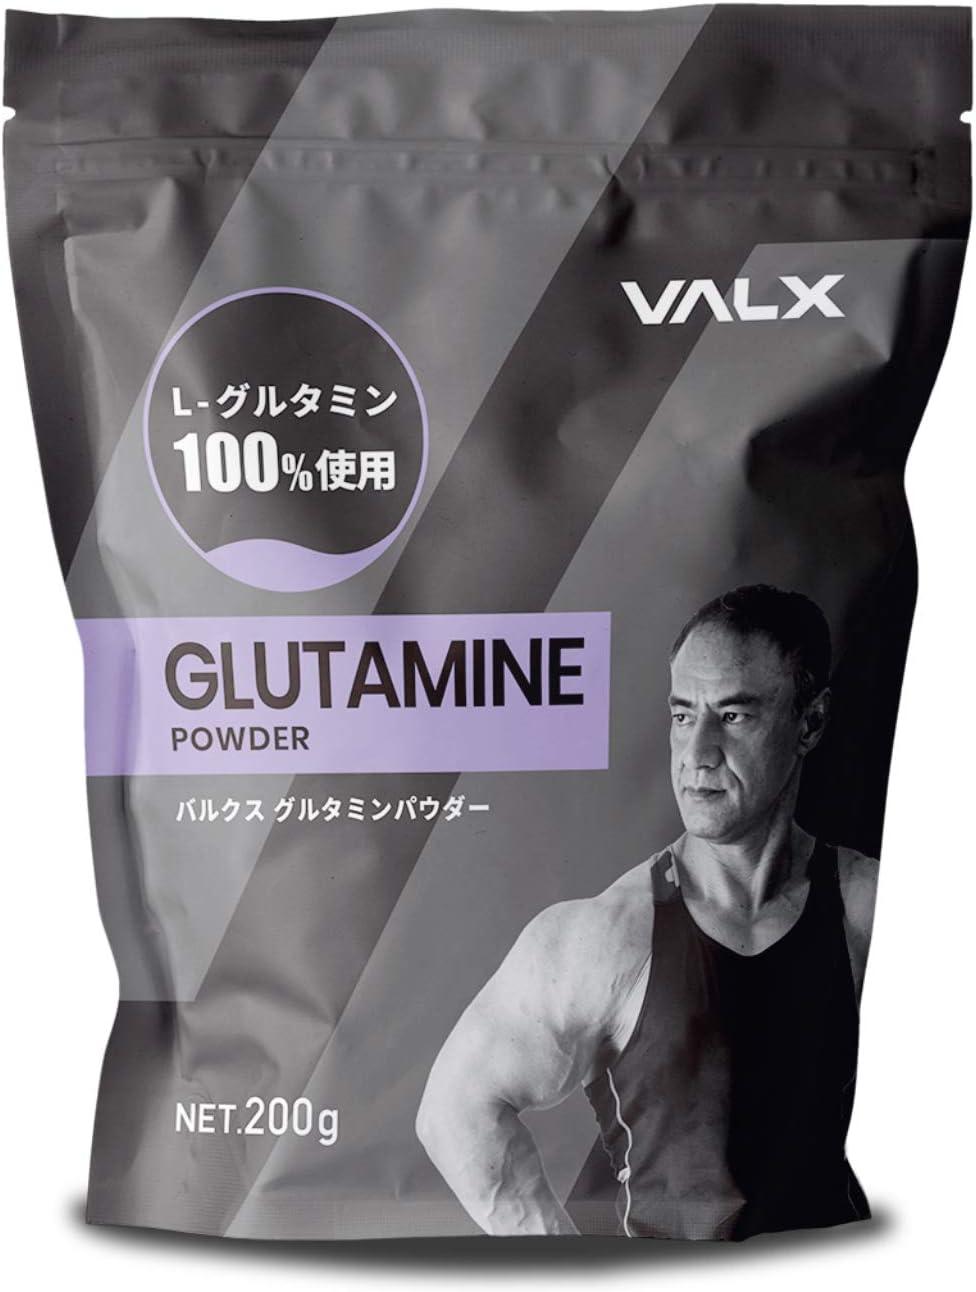 VALX(バルクス )